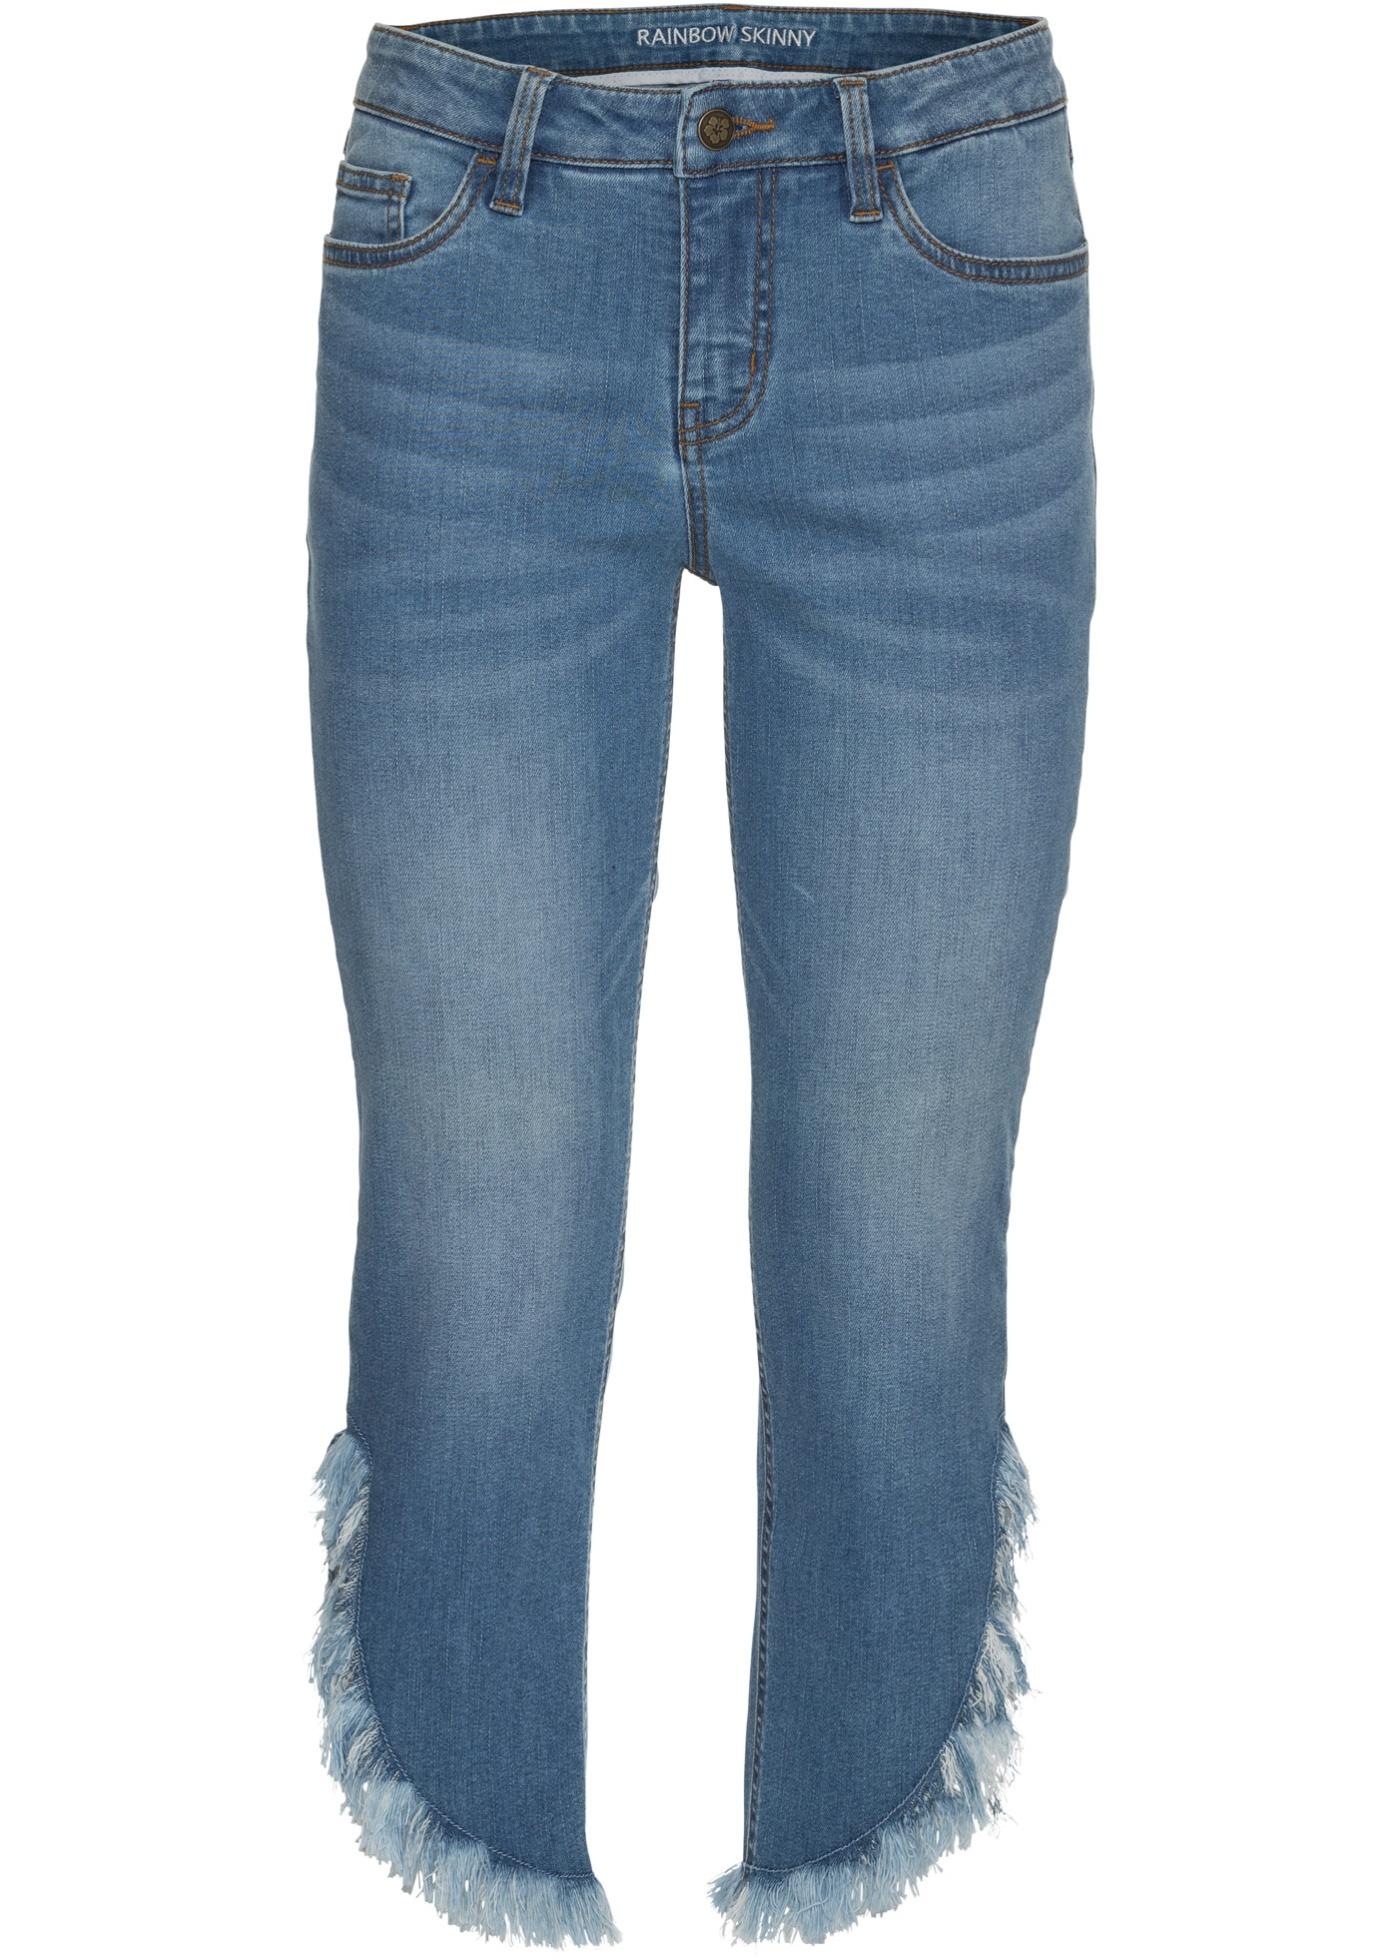 Bonprix SE - Korta smala jeans med fransar 299.00